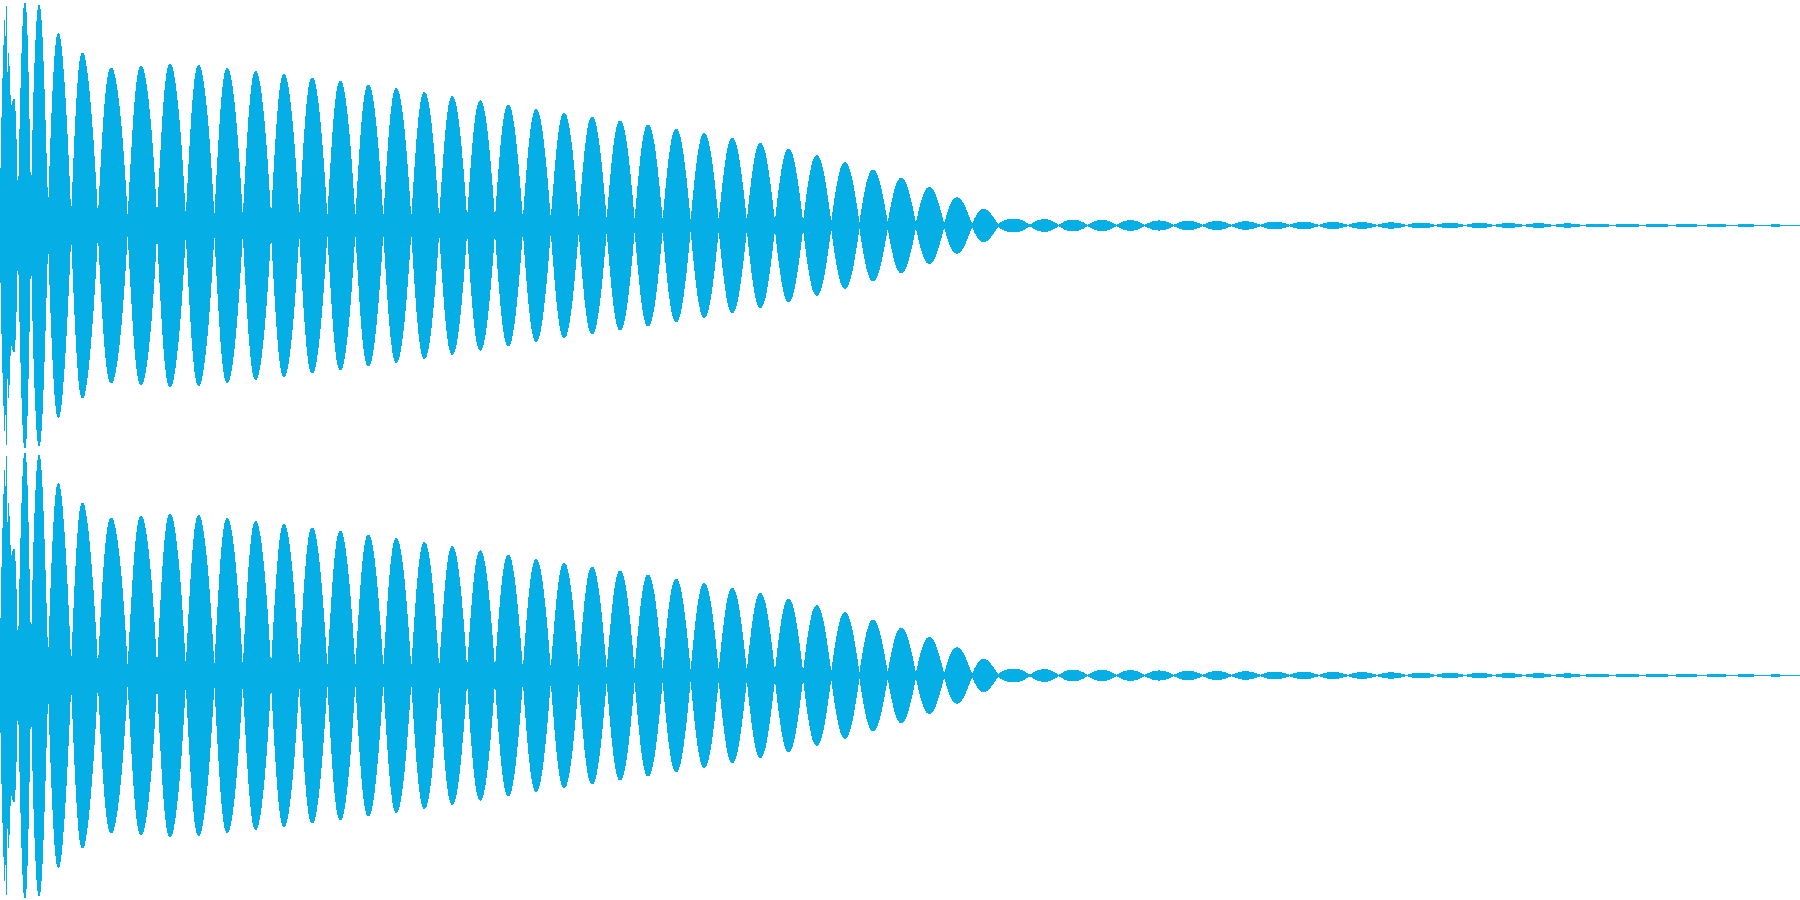 DTM Kick 78 オリジナル音源の再生済みの波形